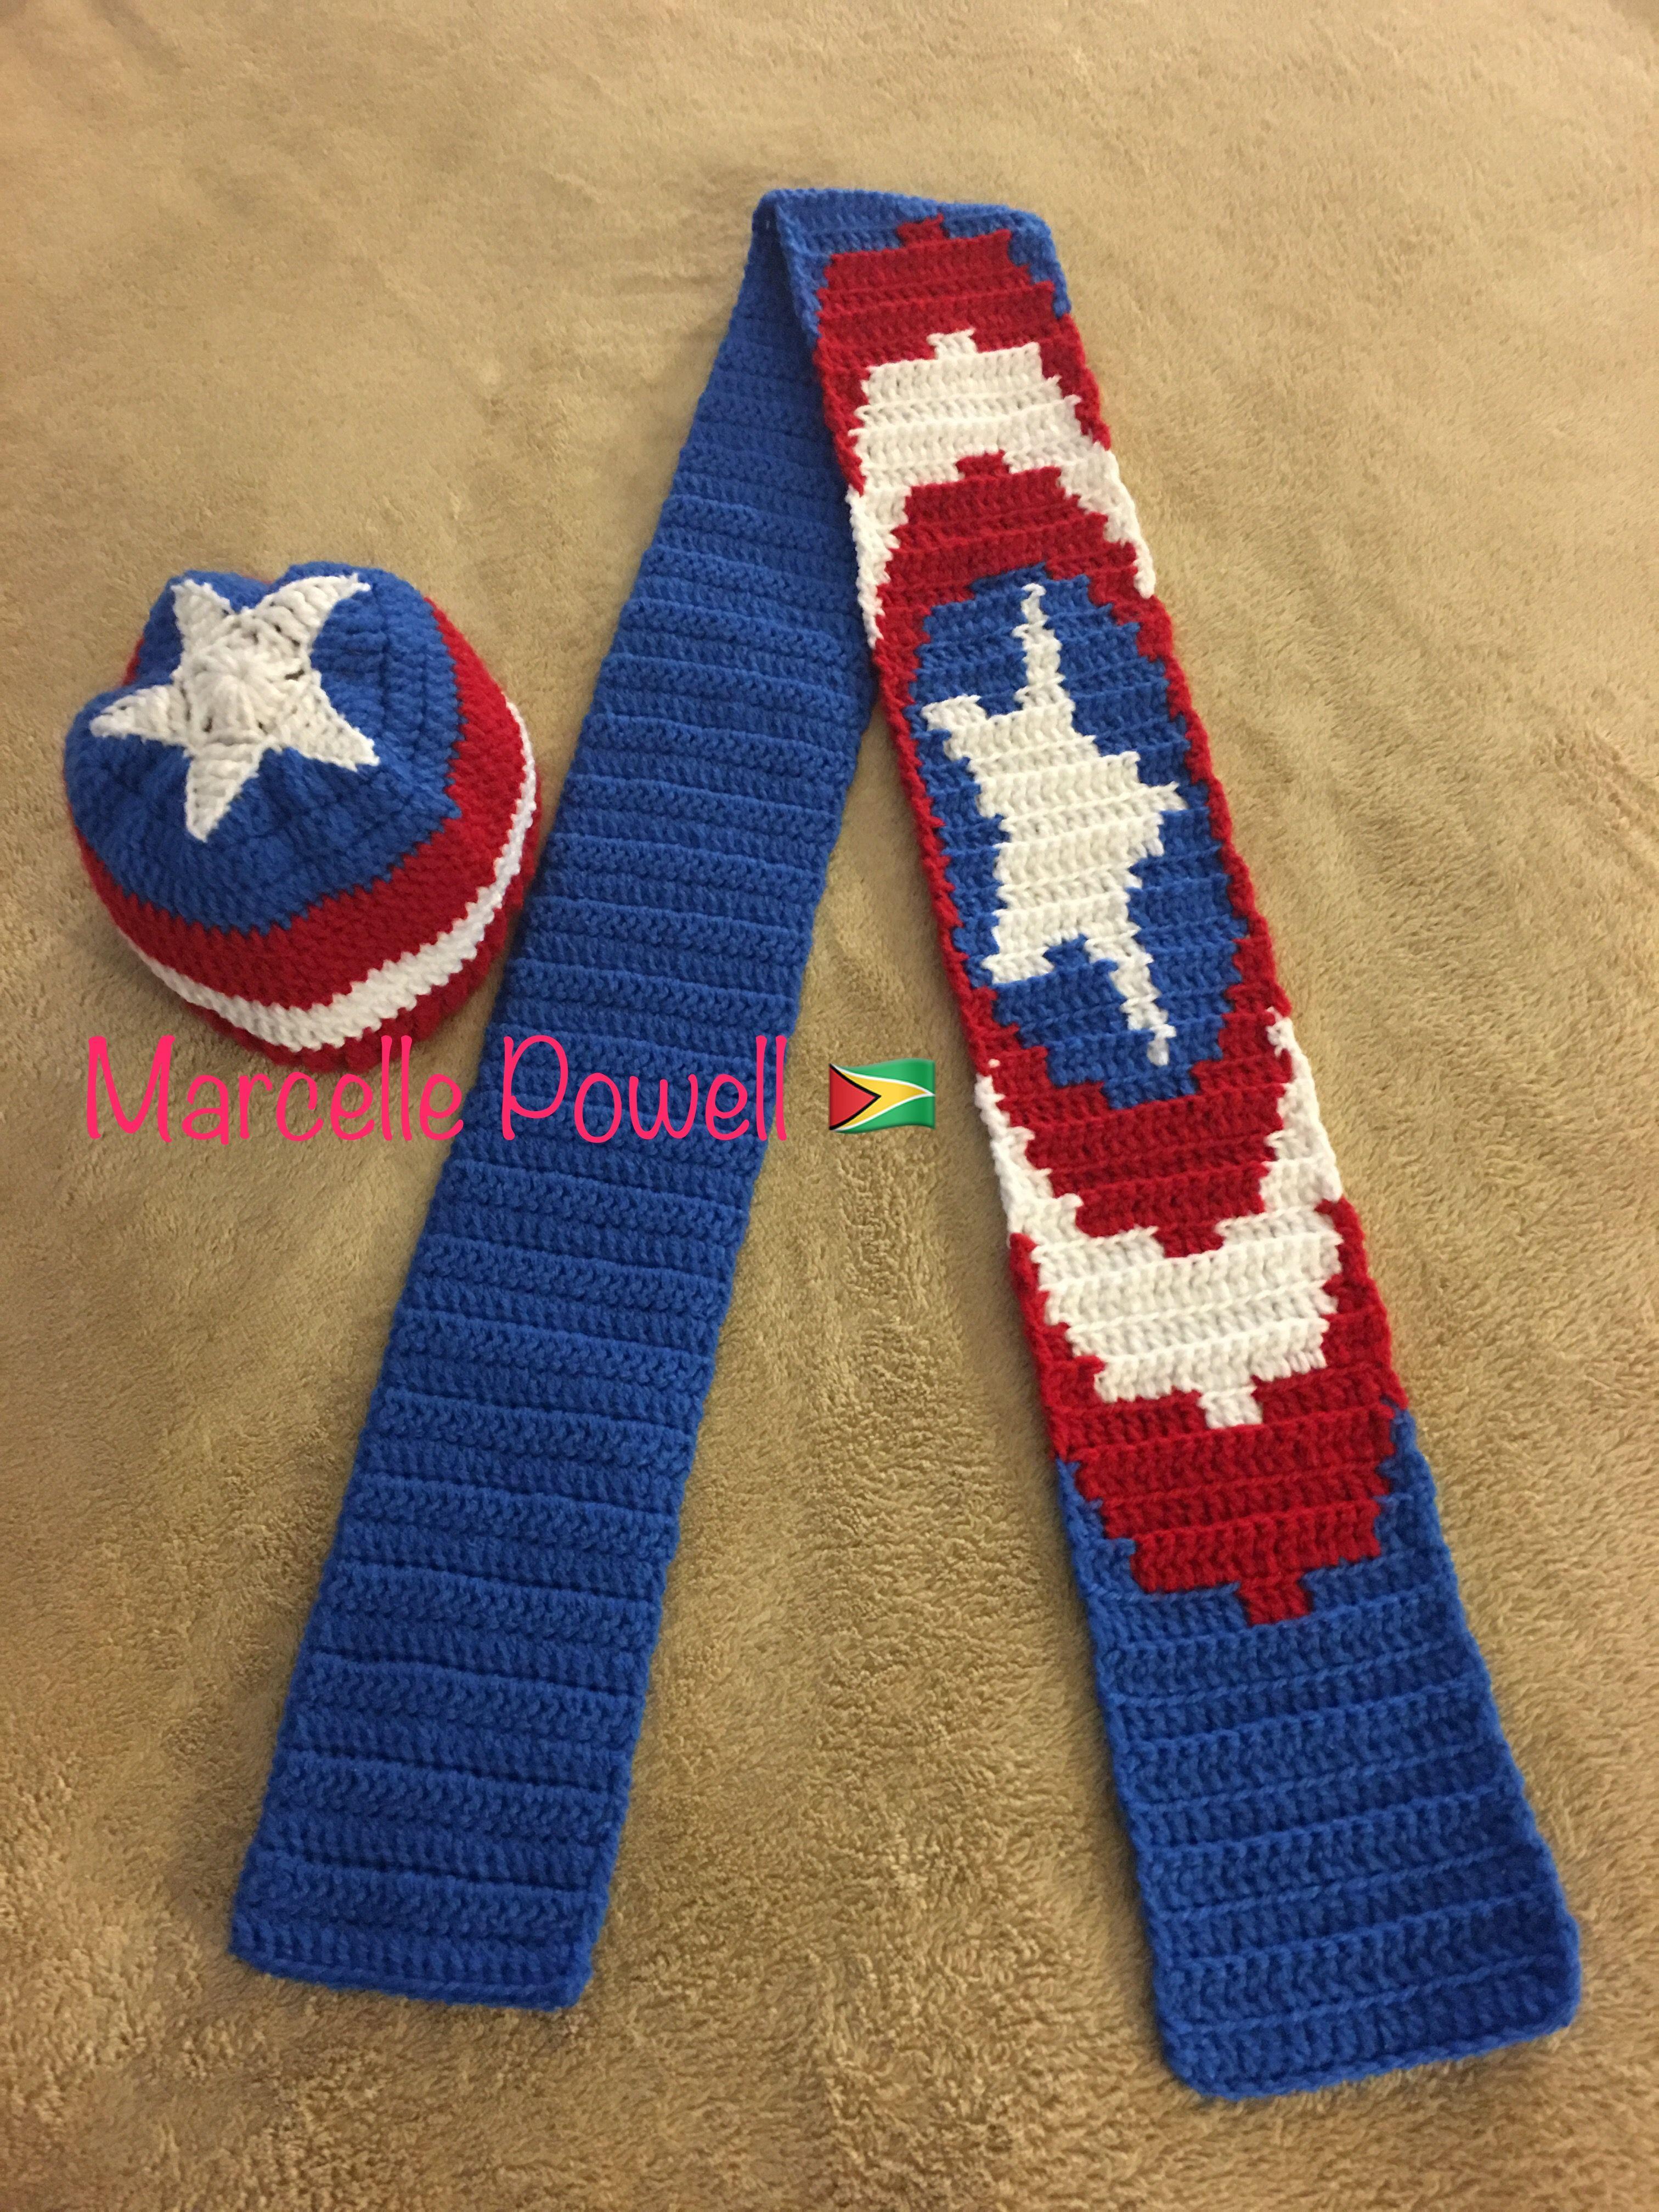 Crochet Captain America Hat & Scarf by Marcelle Powell ❤ | crochet ...